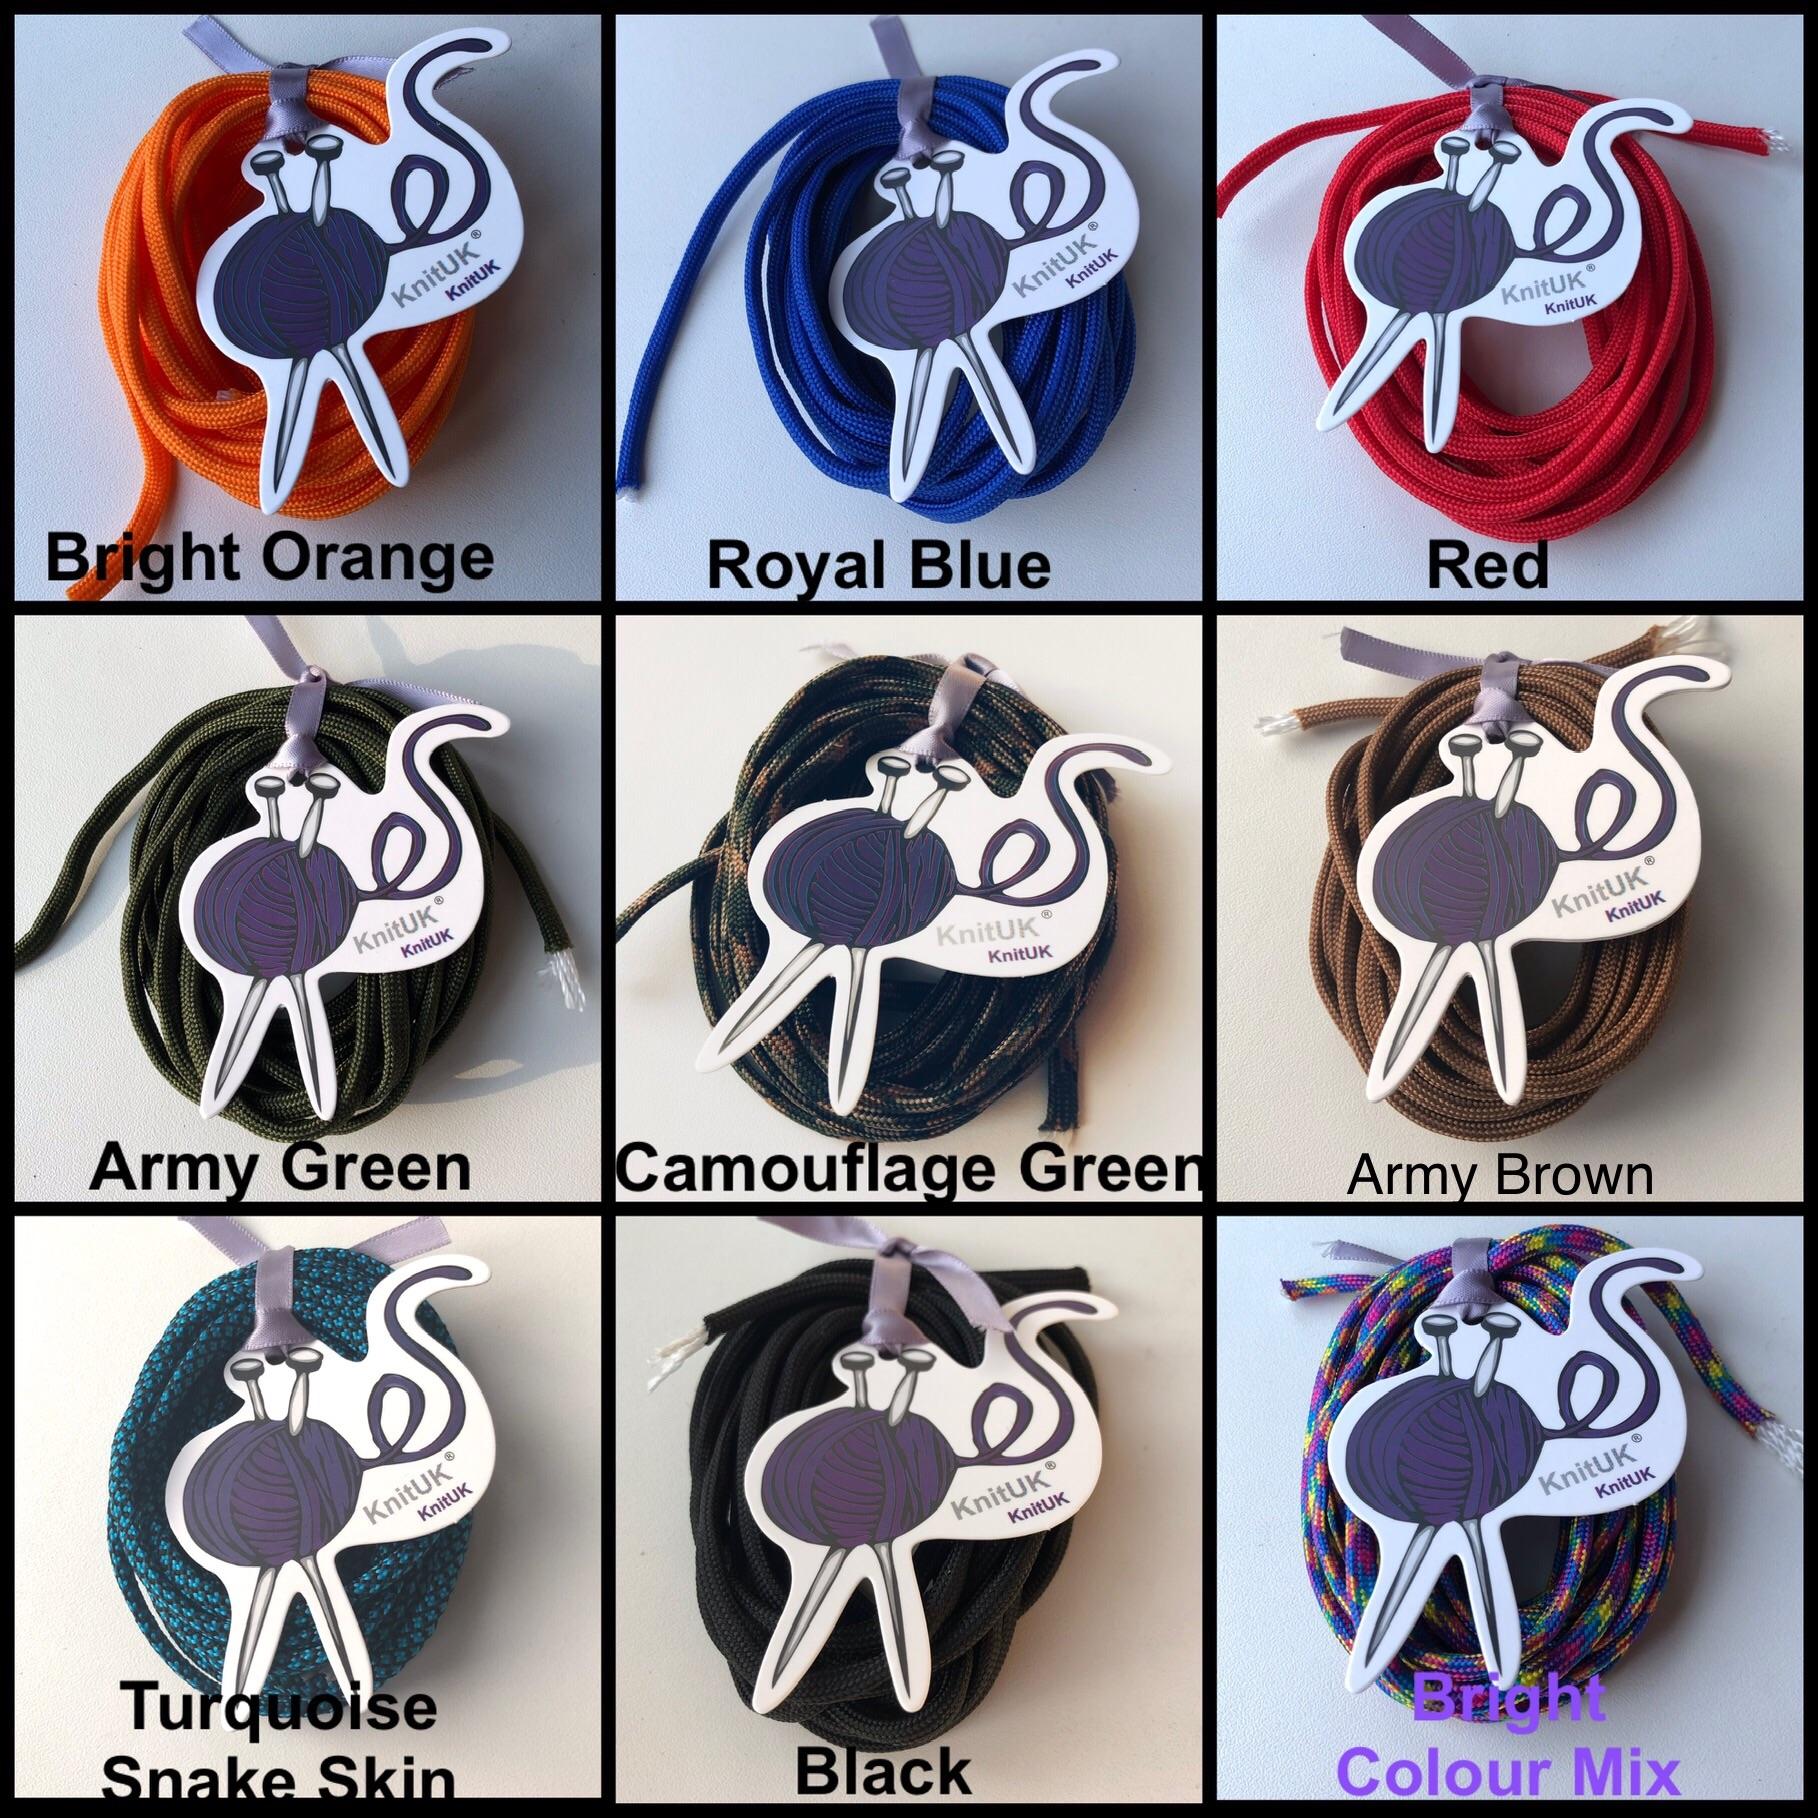 Knituk paracord 550 skein colours